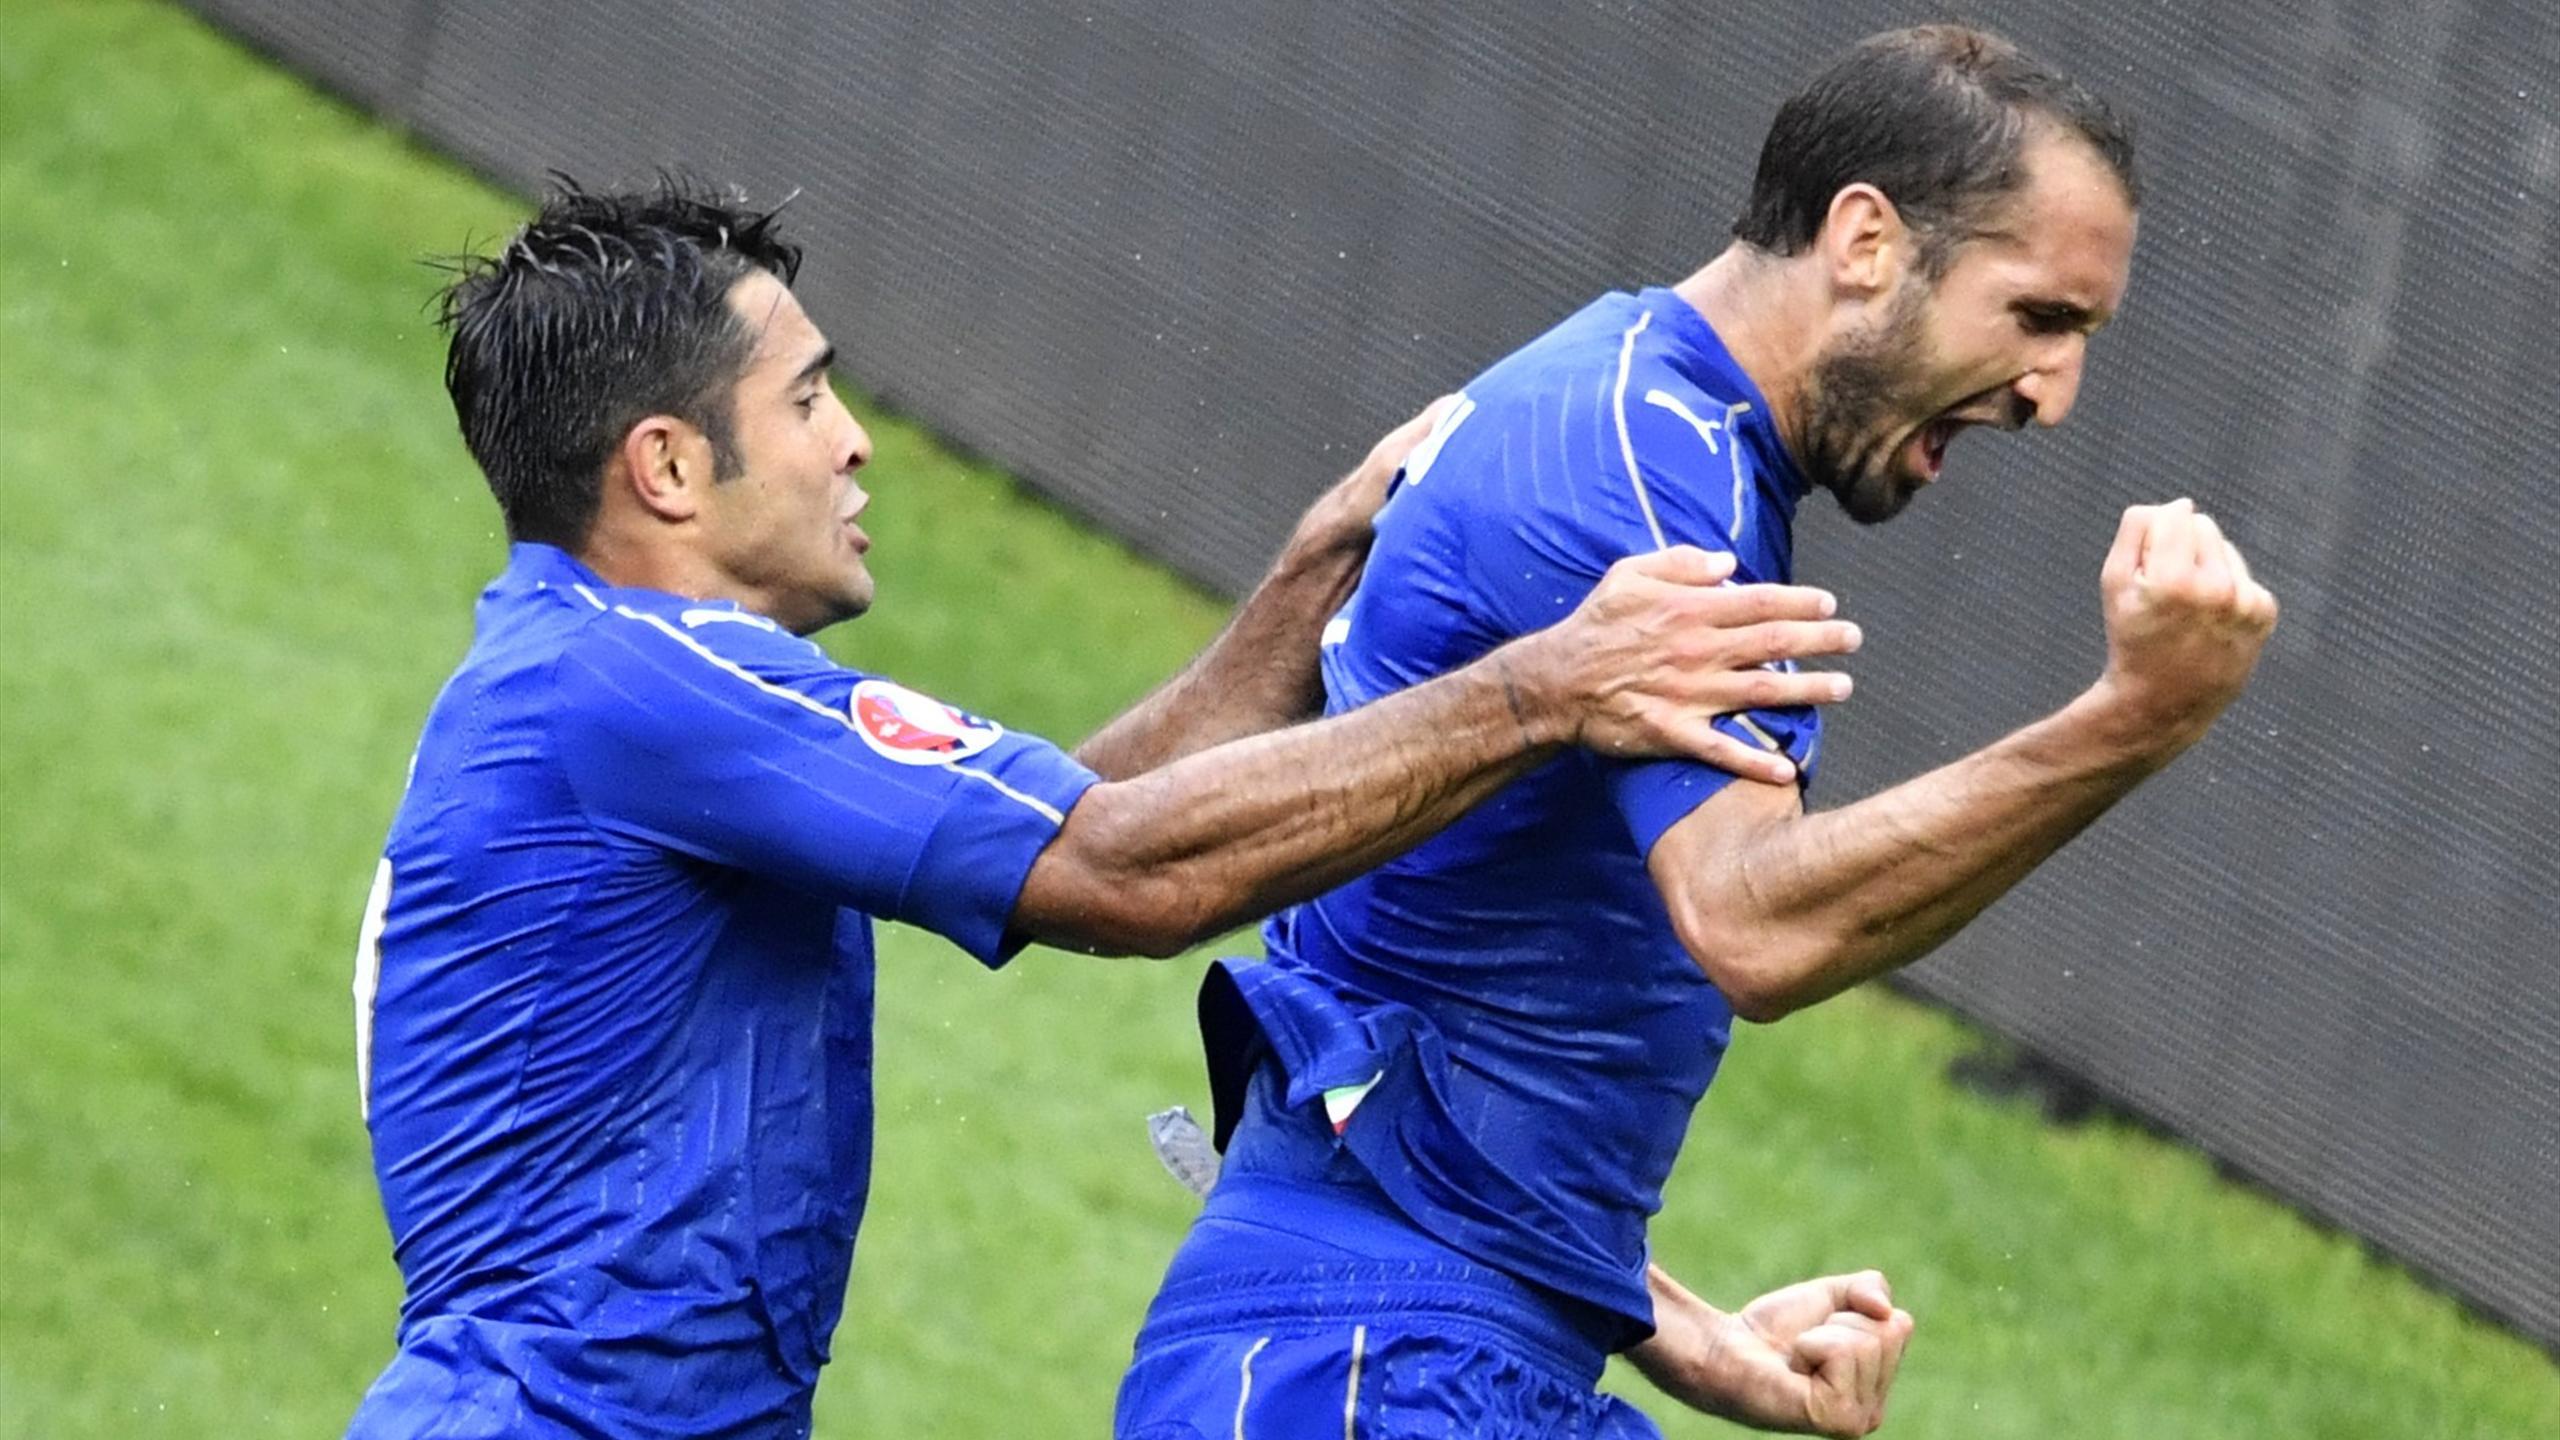 Eder Chiellini - Italy v Spain - Euro 2016